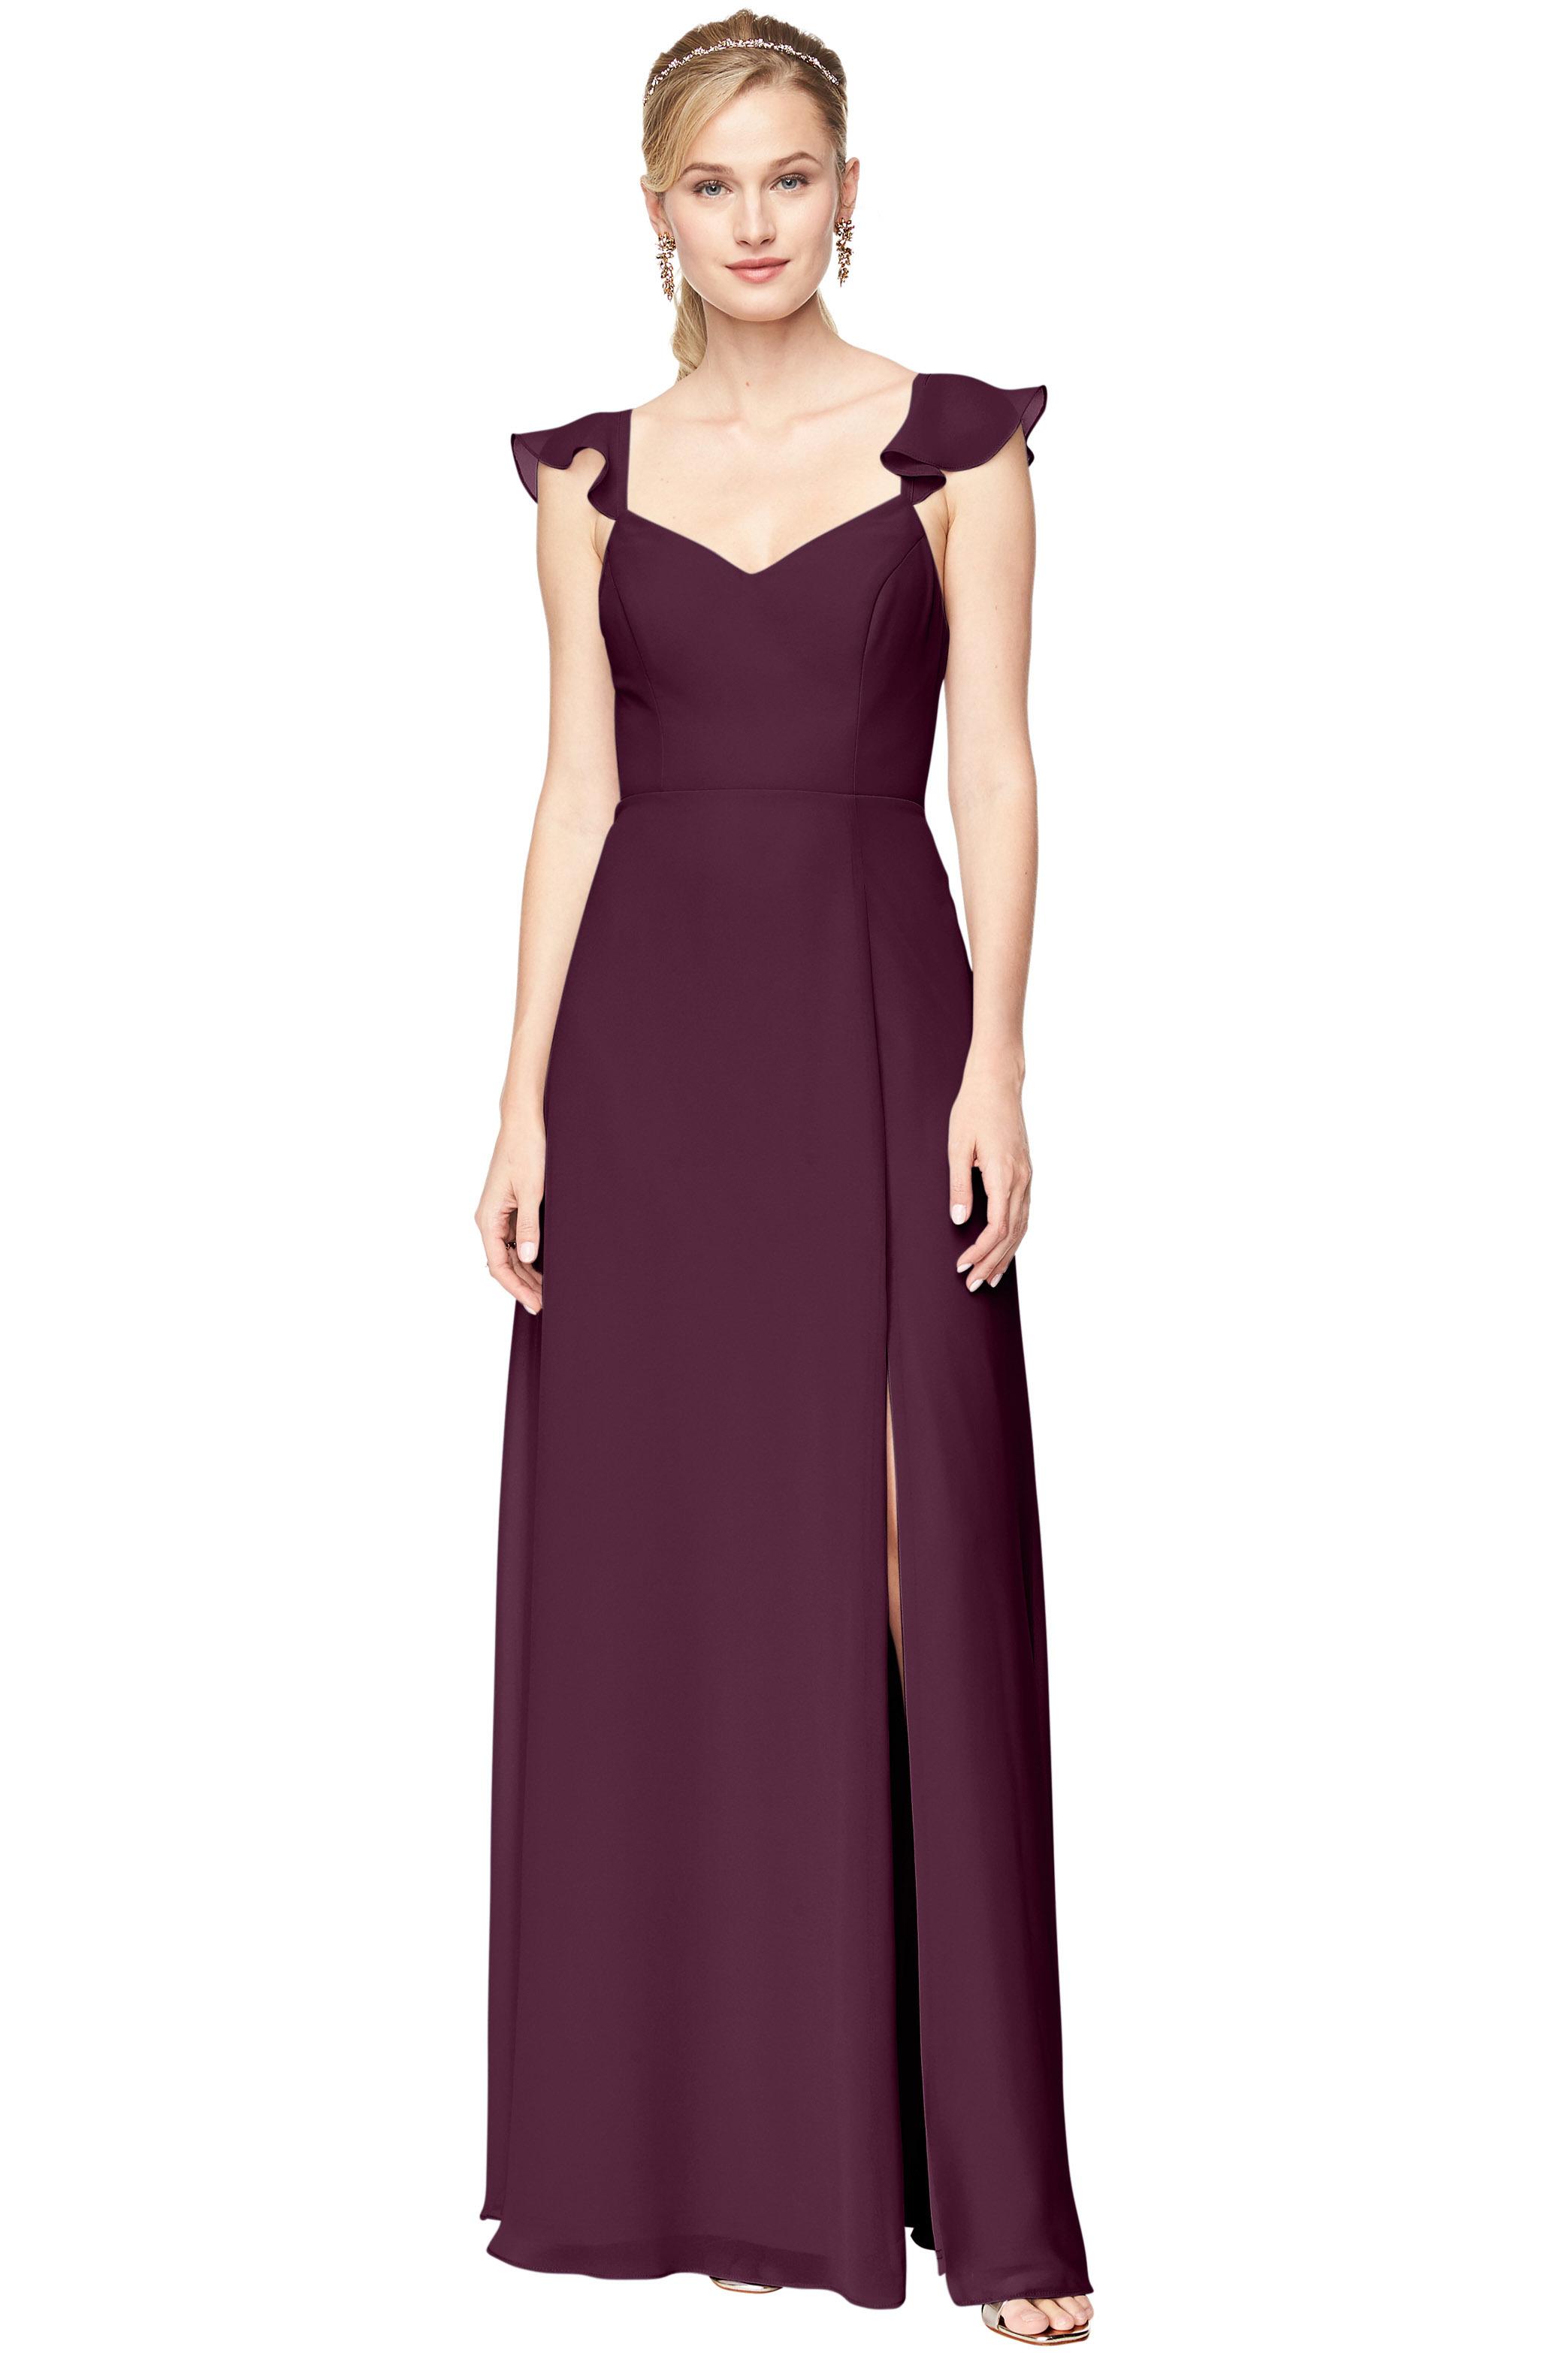 Bill Levkoff EGGPLANT Chiffon V-Neck A-line gown, $198.00 Front